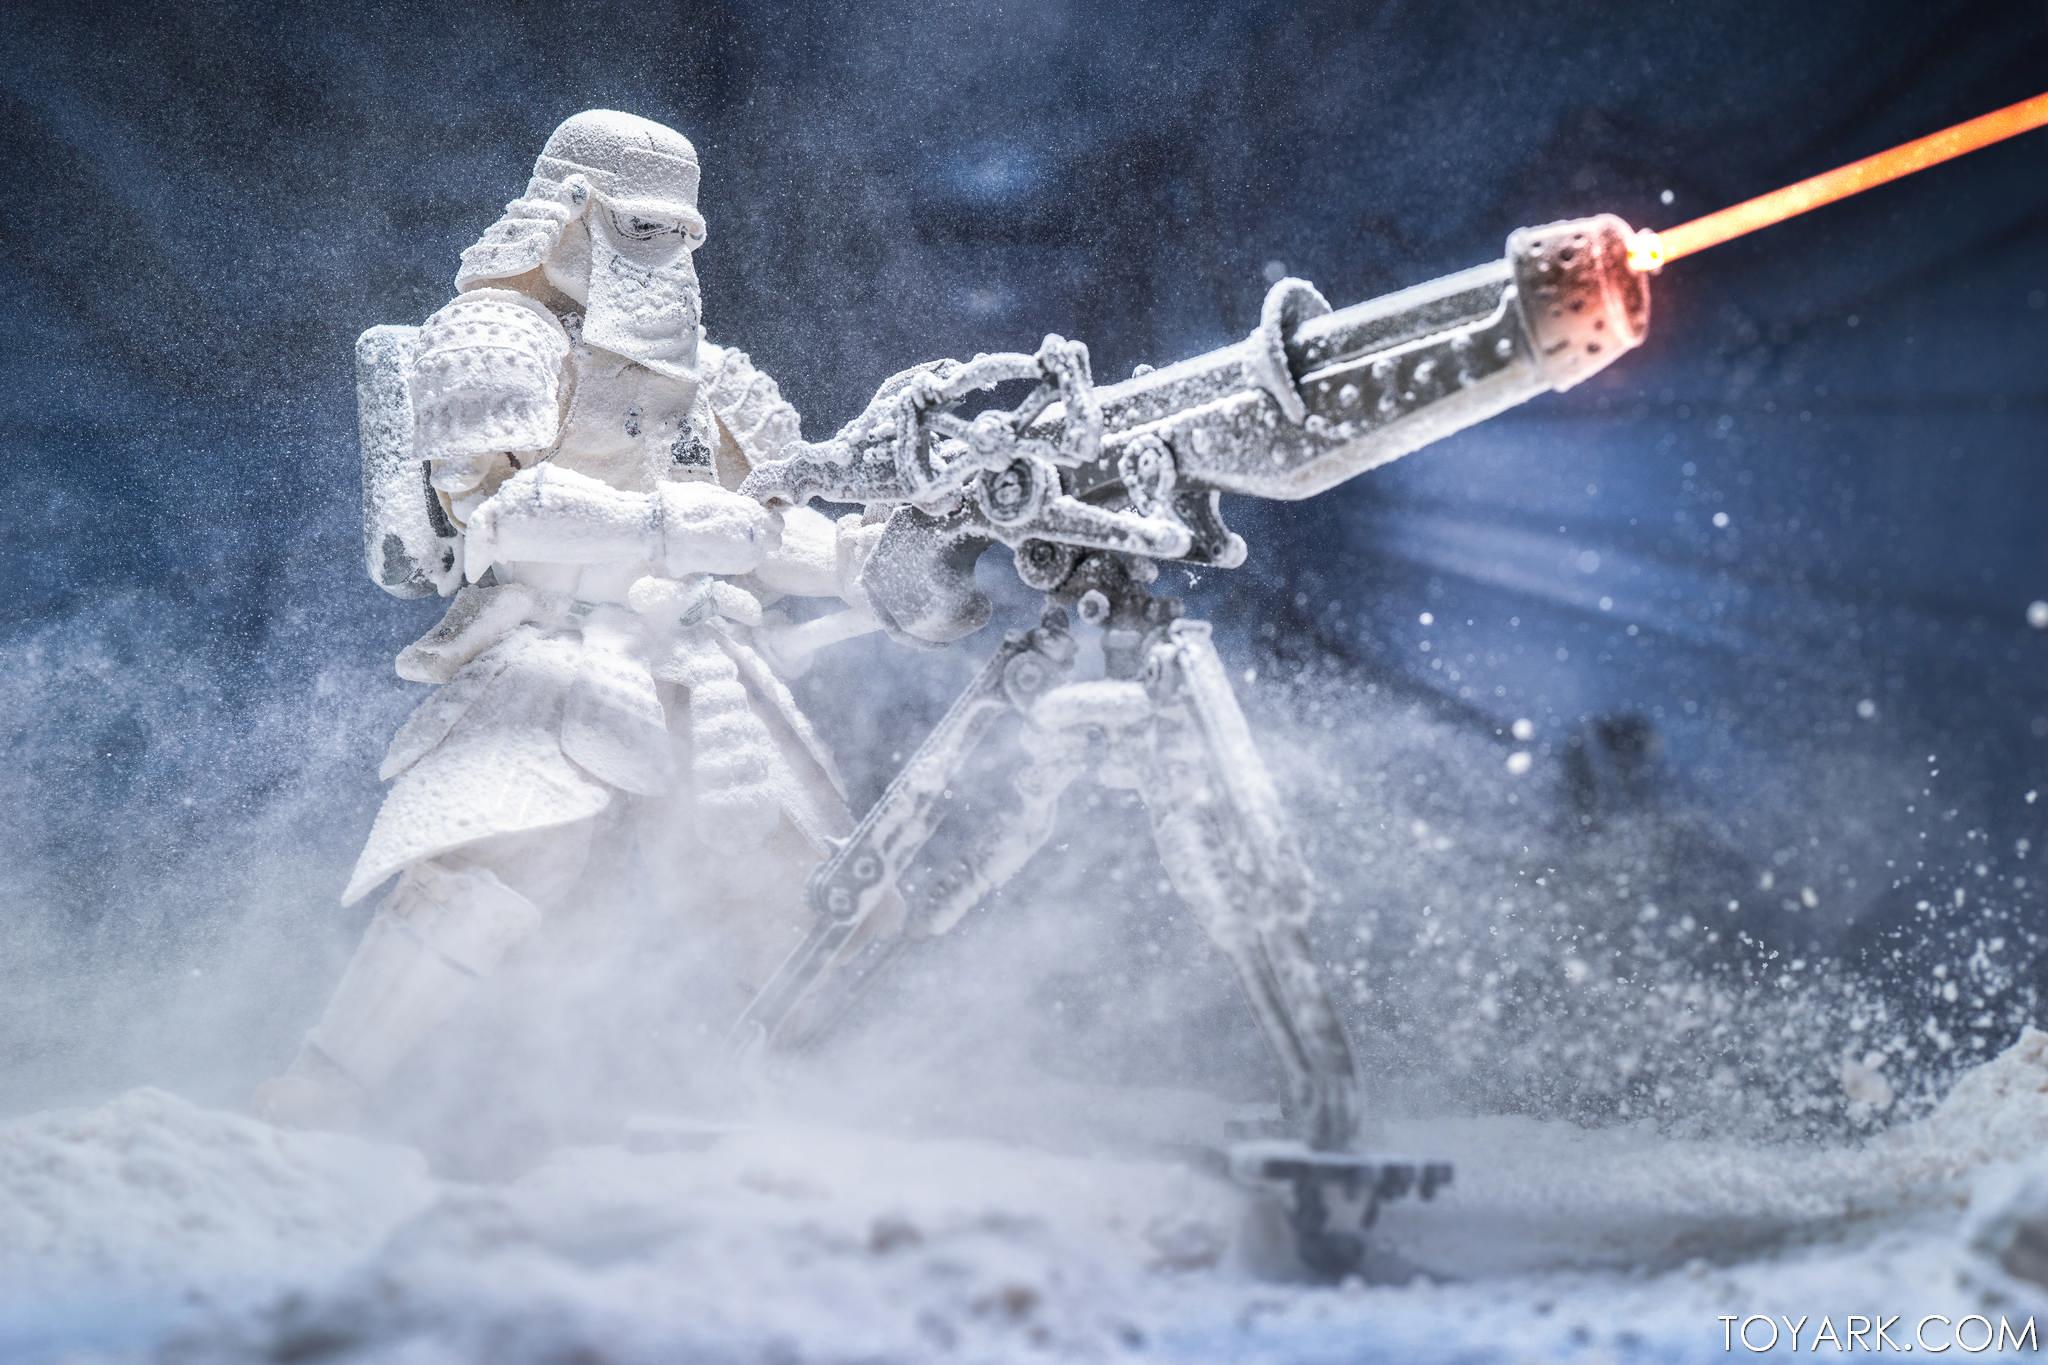 STAR WARS Movie Realization - KANREICHI ASHIGARU SNOWTROOPER Realization-Snowtrooper-44